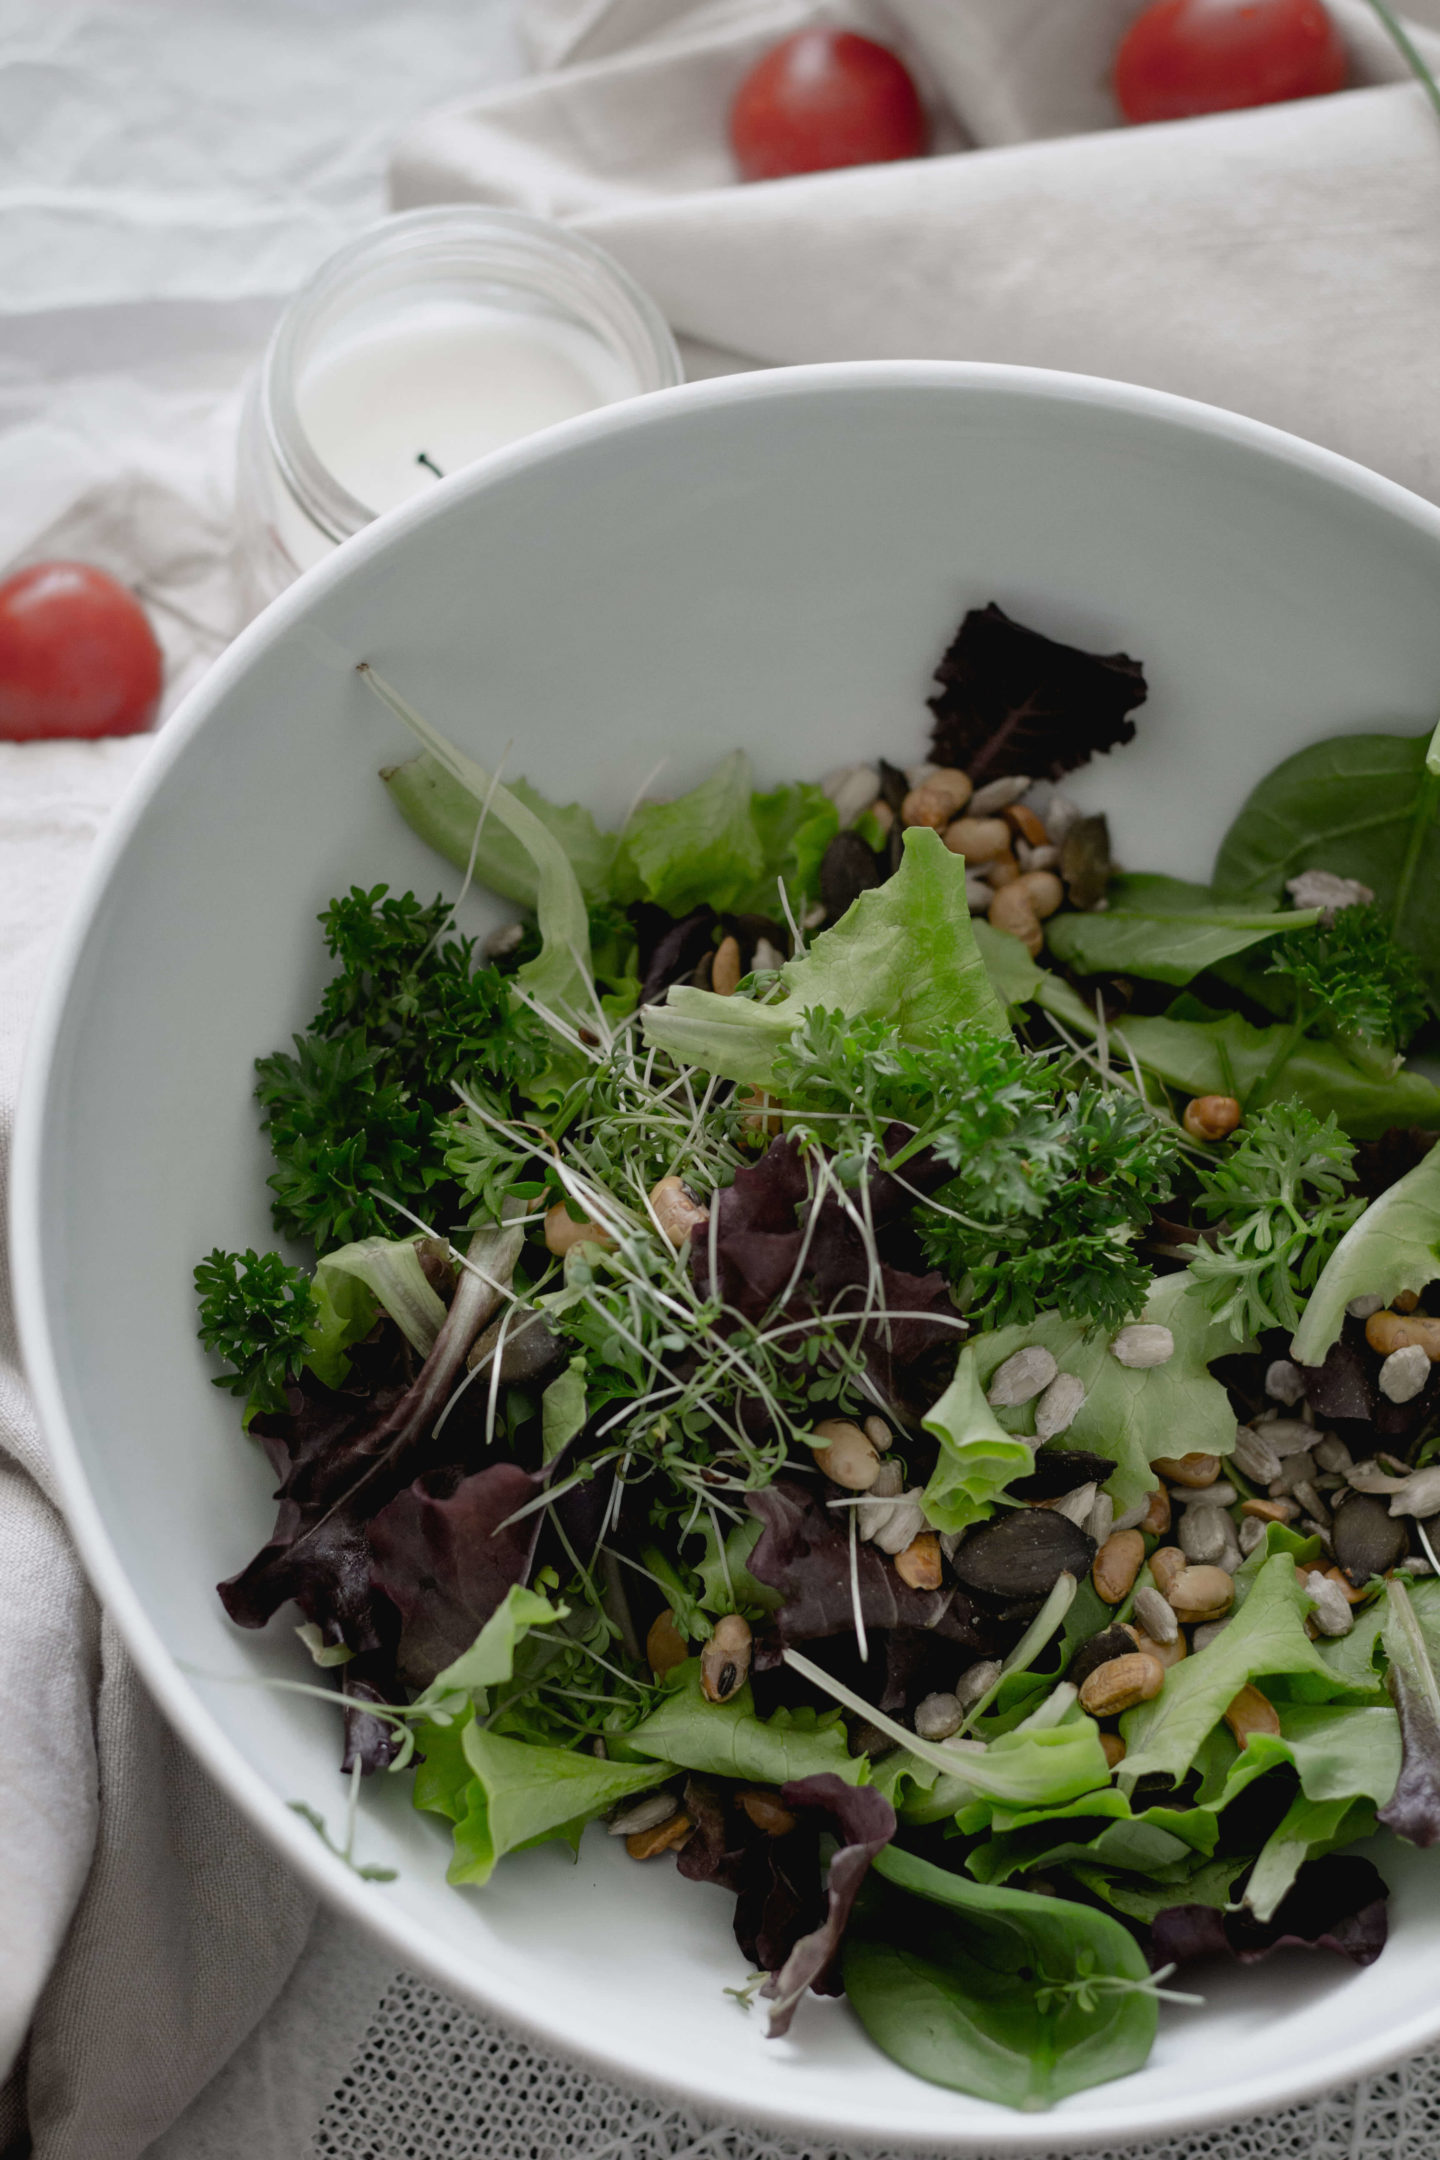 Veganer Linsensalat mit Rote Rüben - Soulfood - Schnelle vegane ...